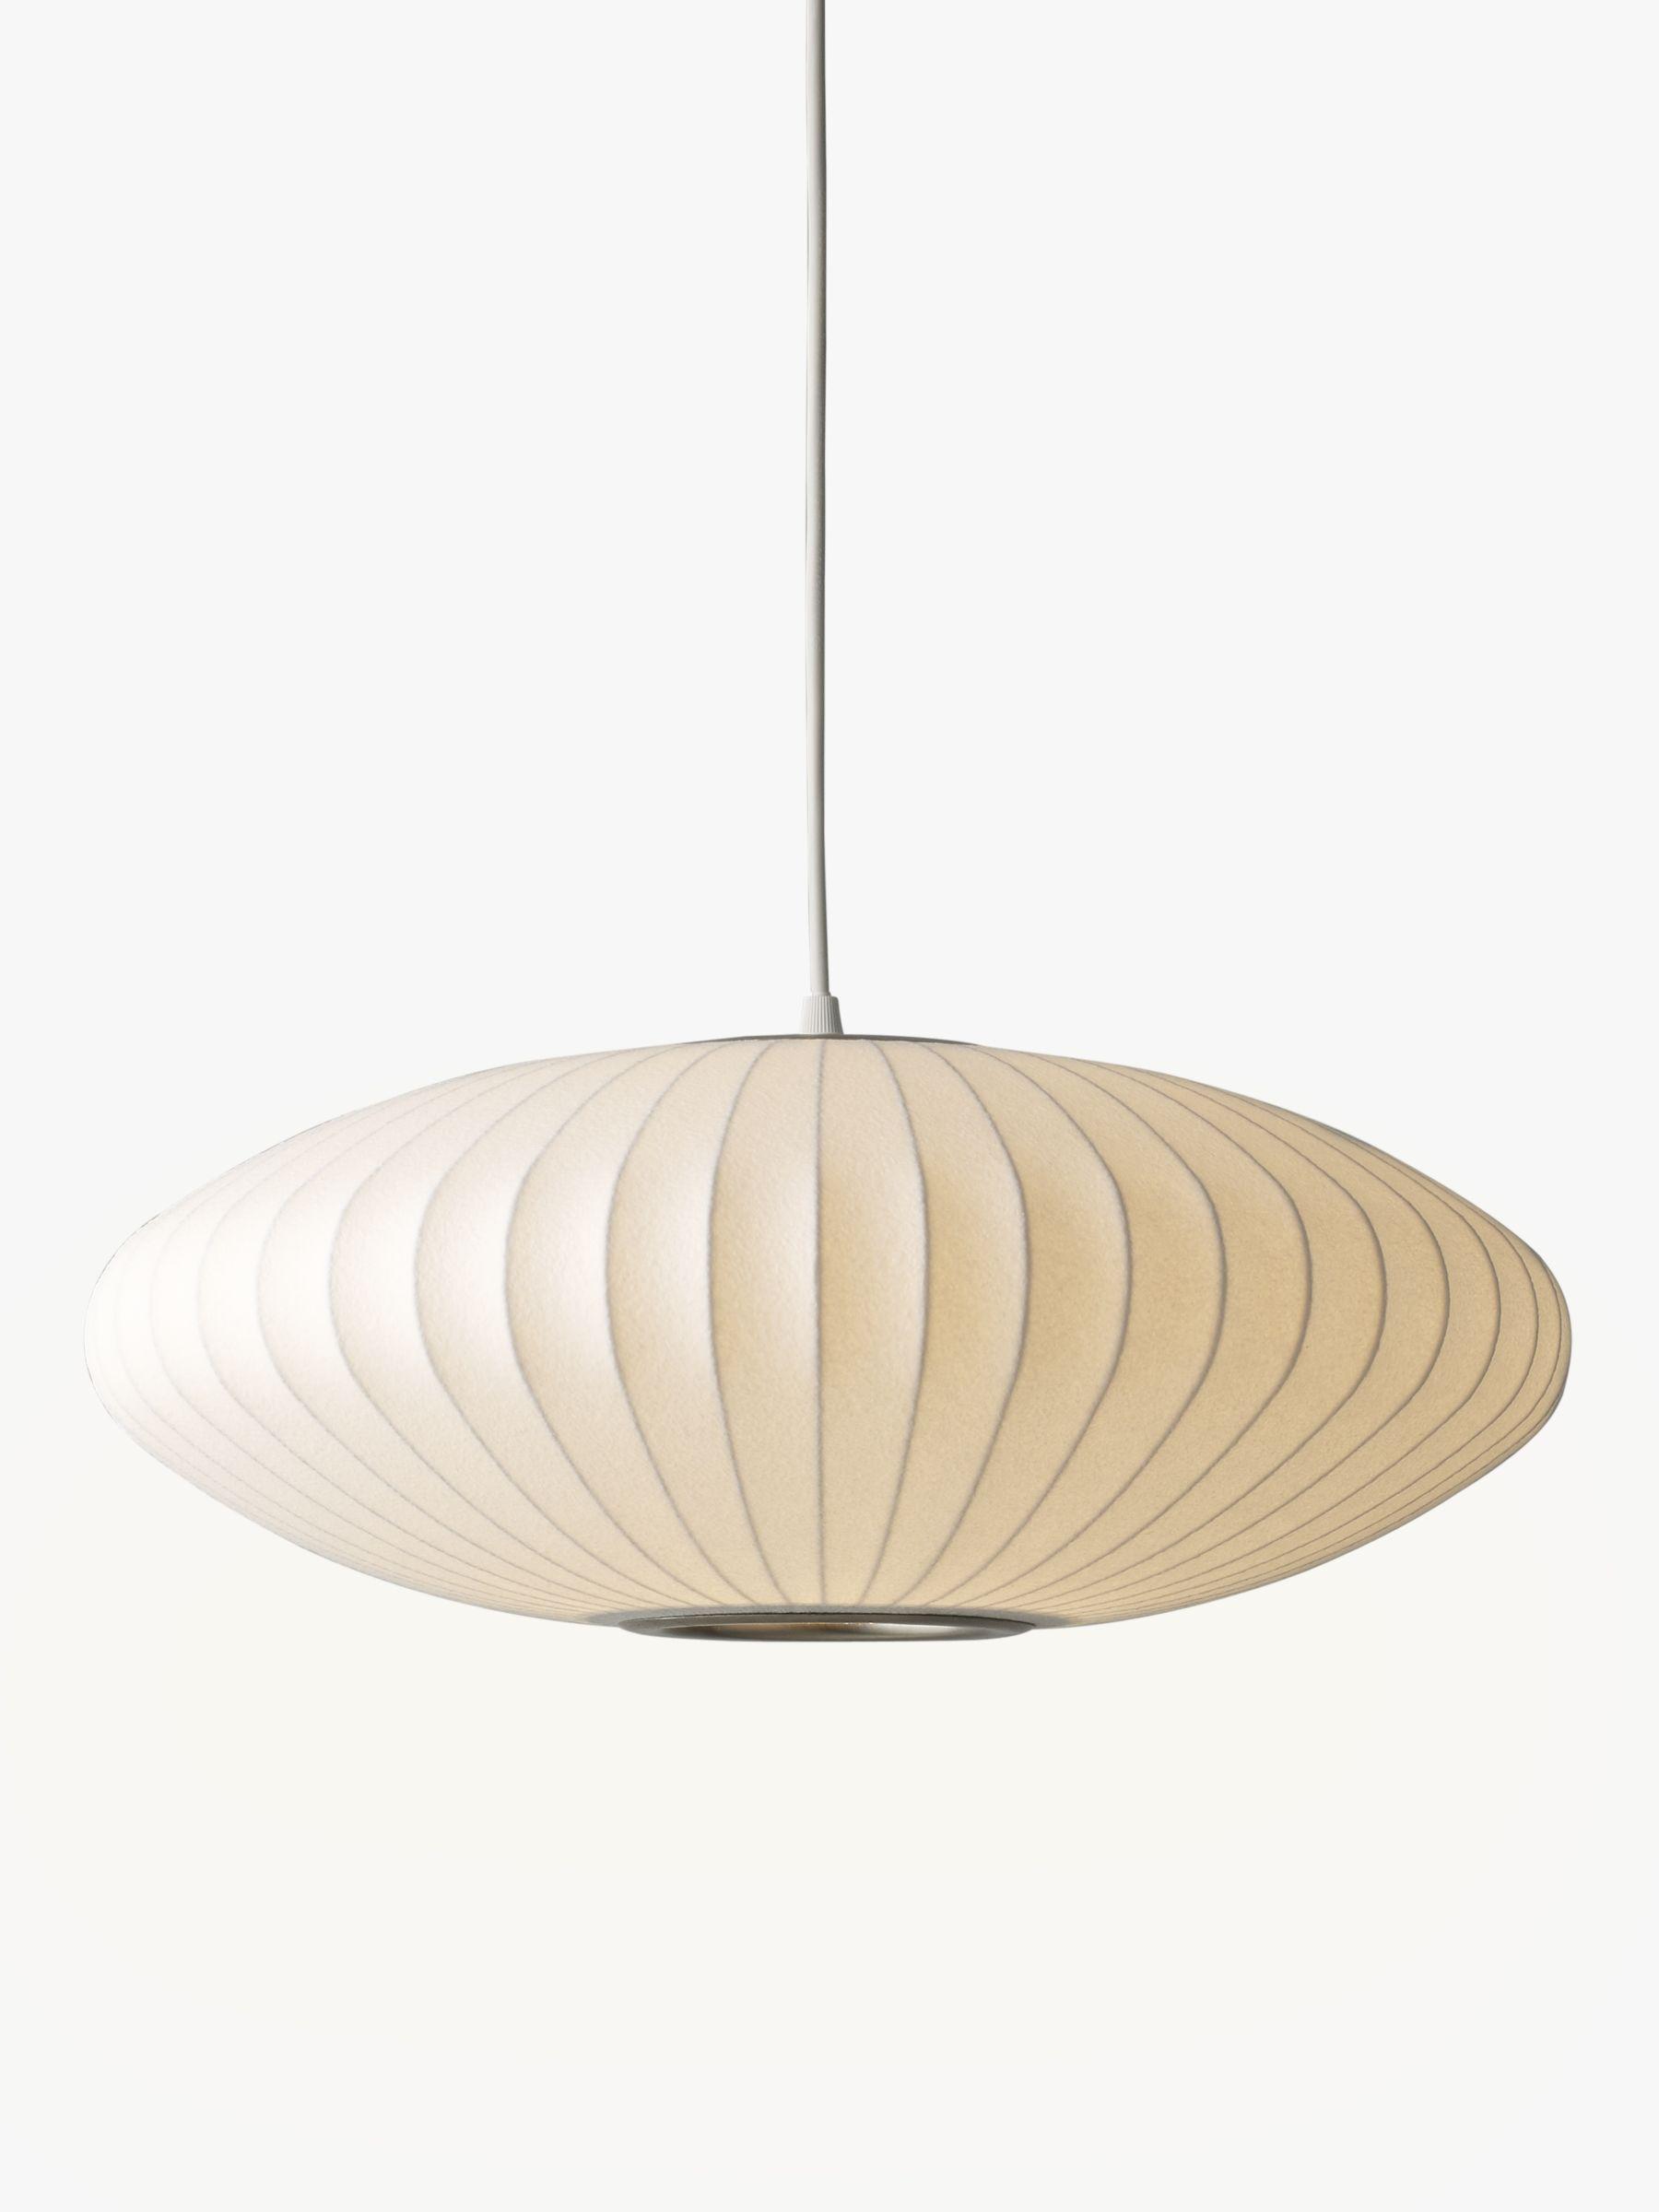 herman miller bubble saucer ceiling light medium